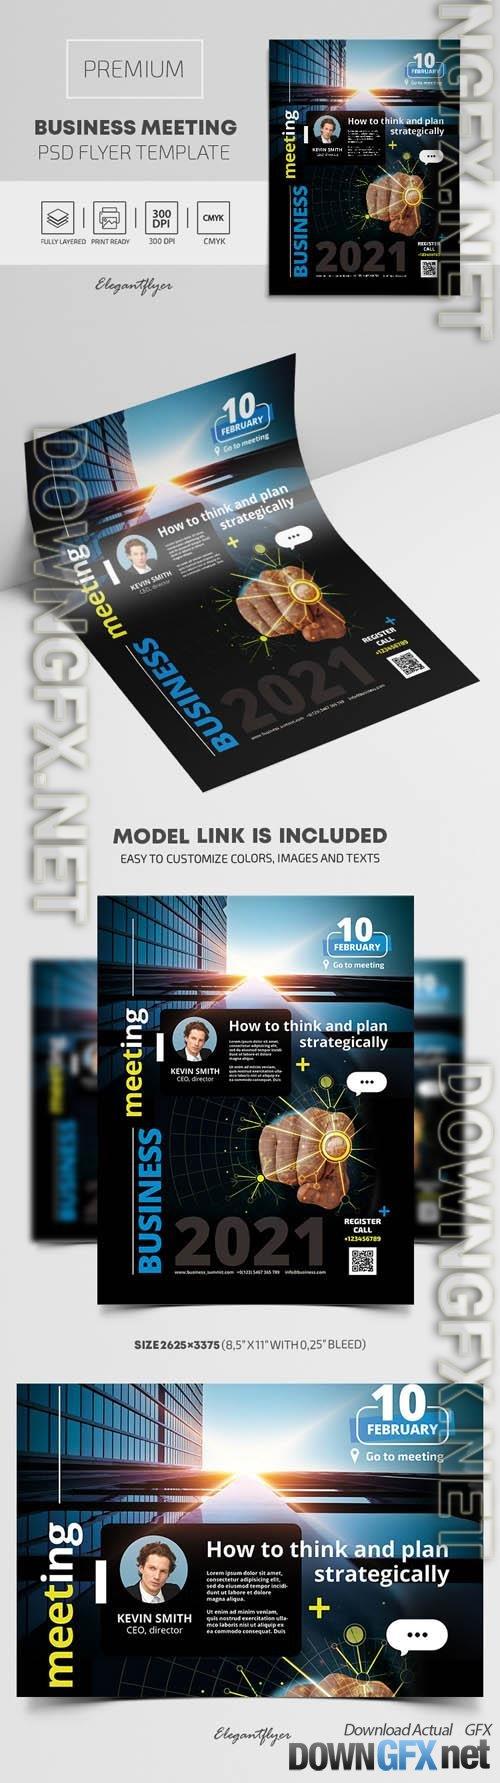 Business Meeting  Premium PSD Flyer Template